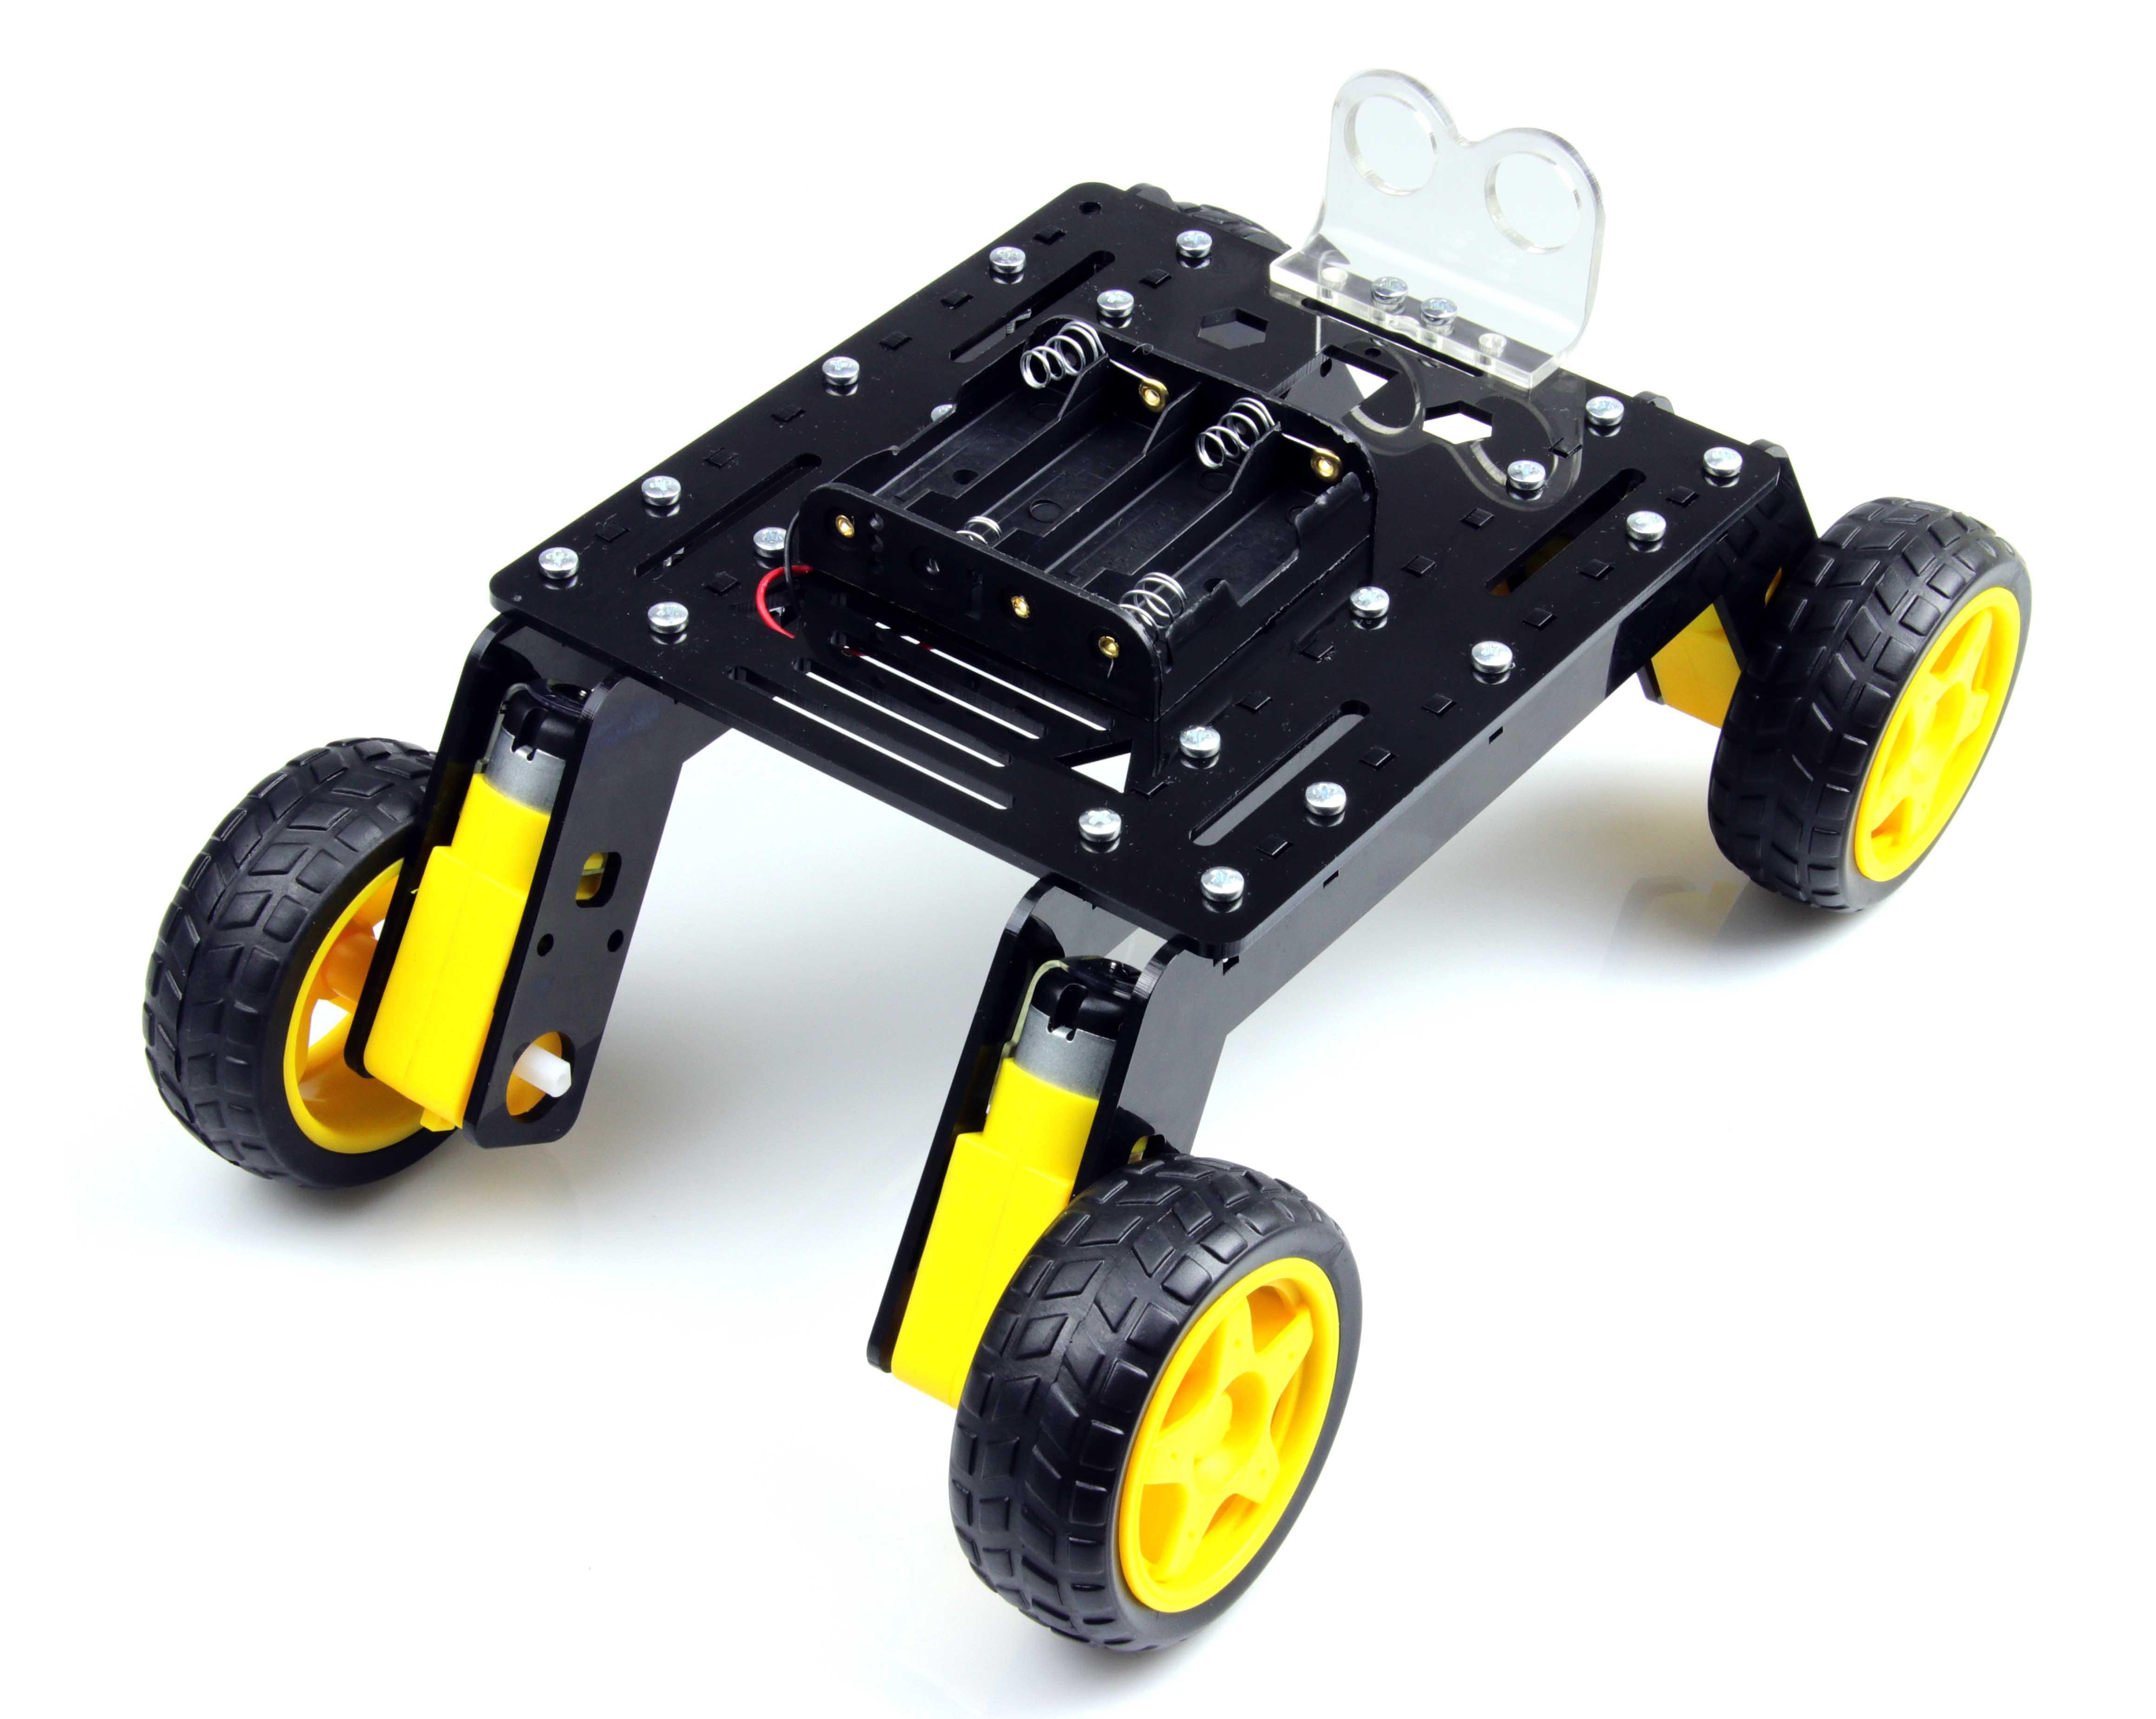 Rover 4WD Explorer Mobile Robot Chassis (Plexiglass Body)